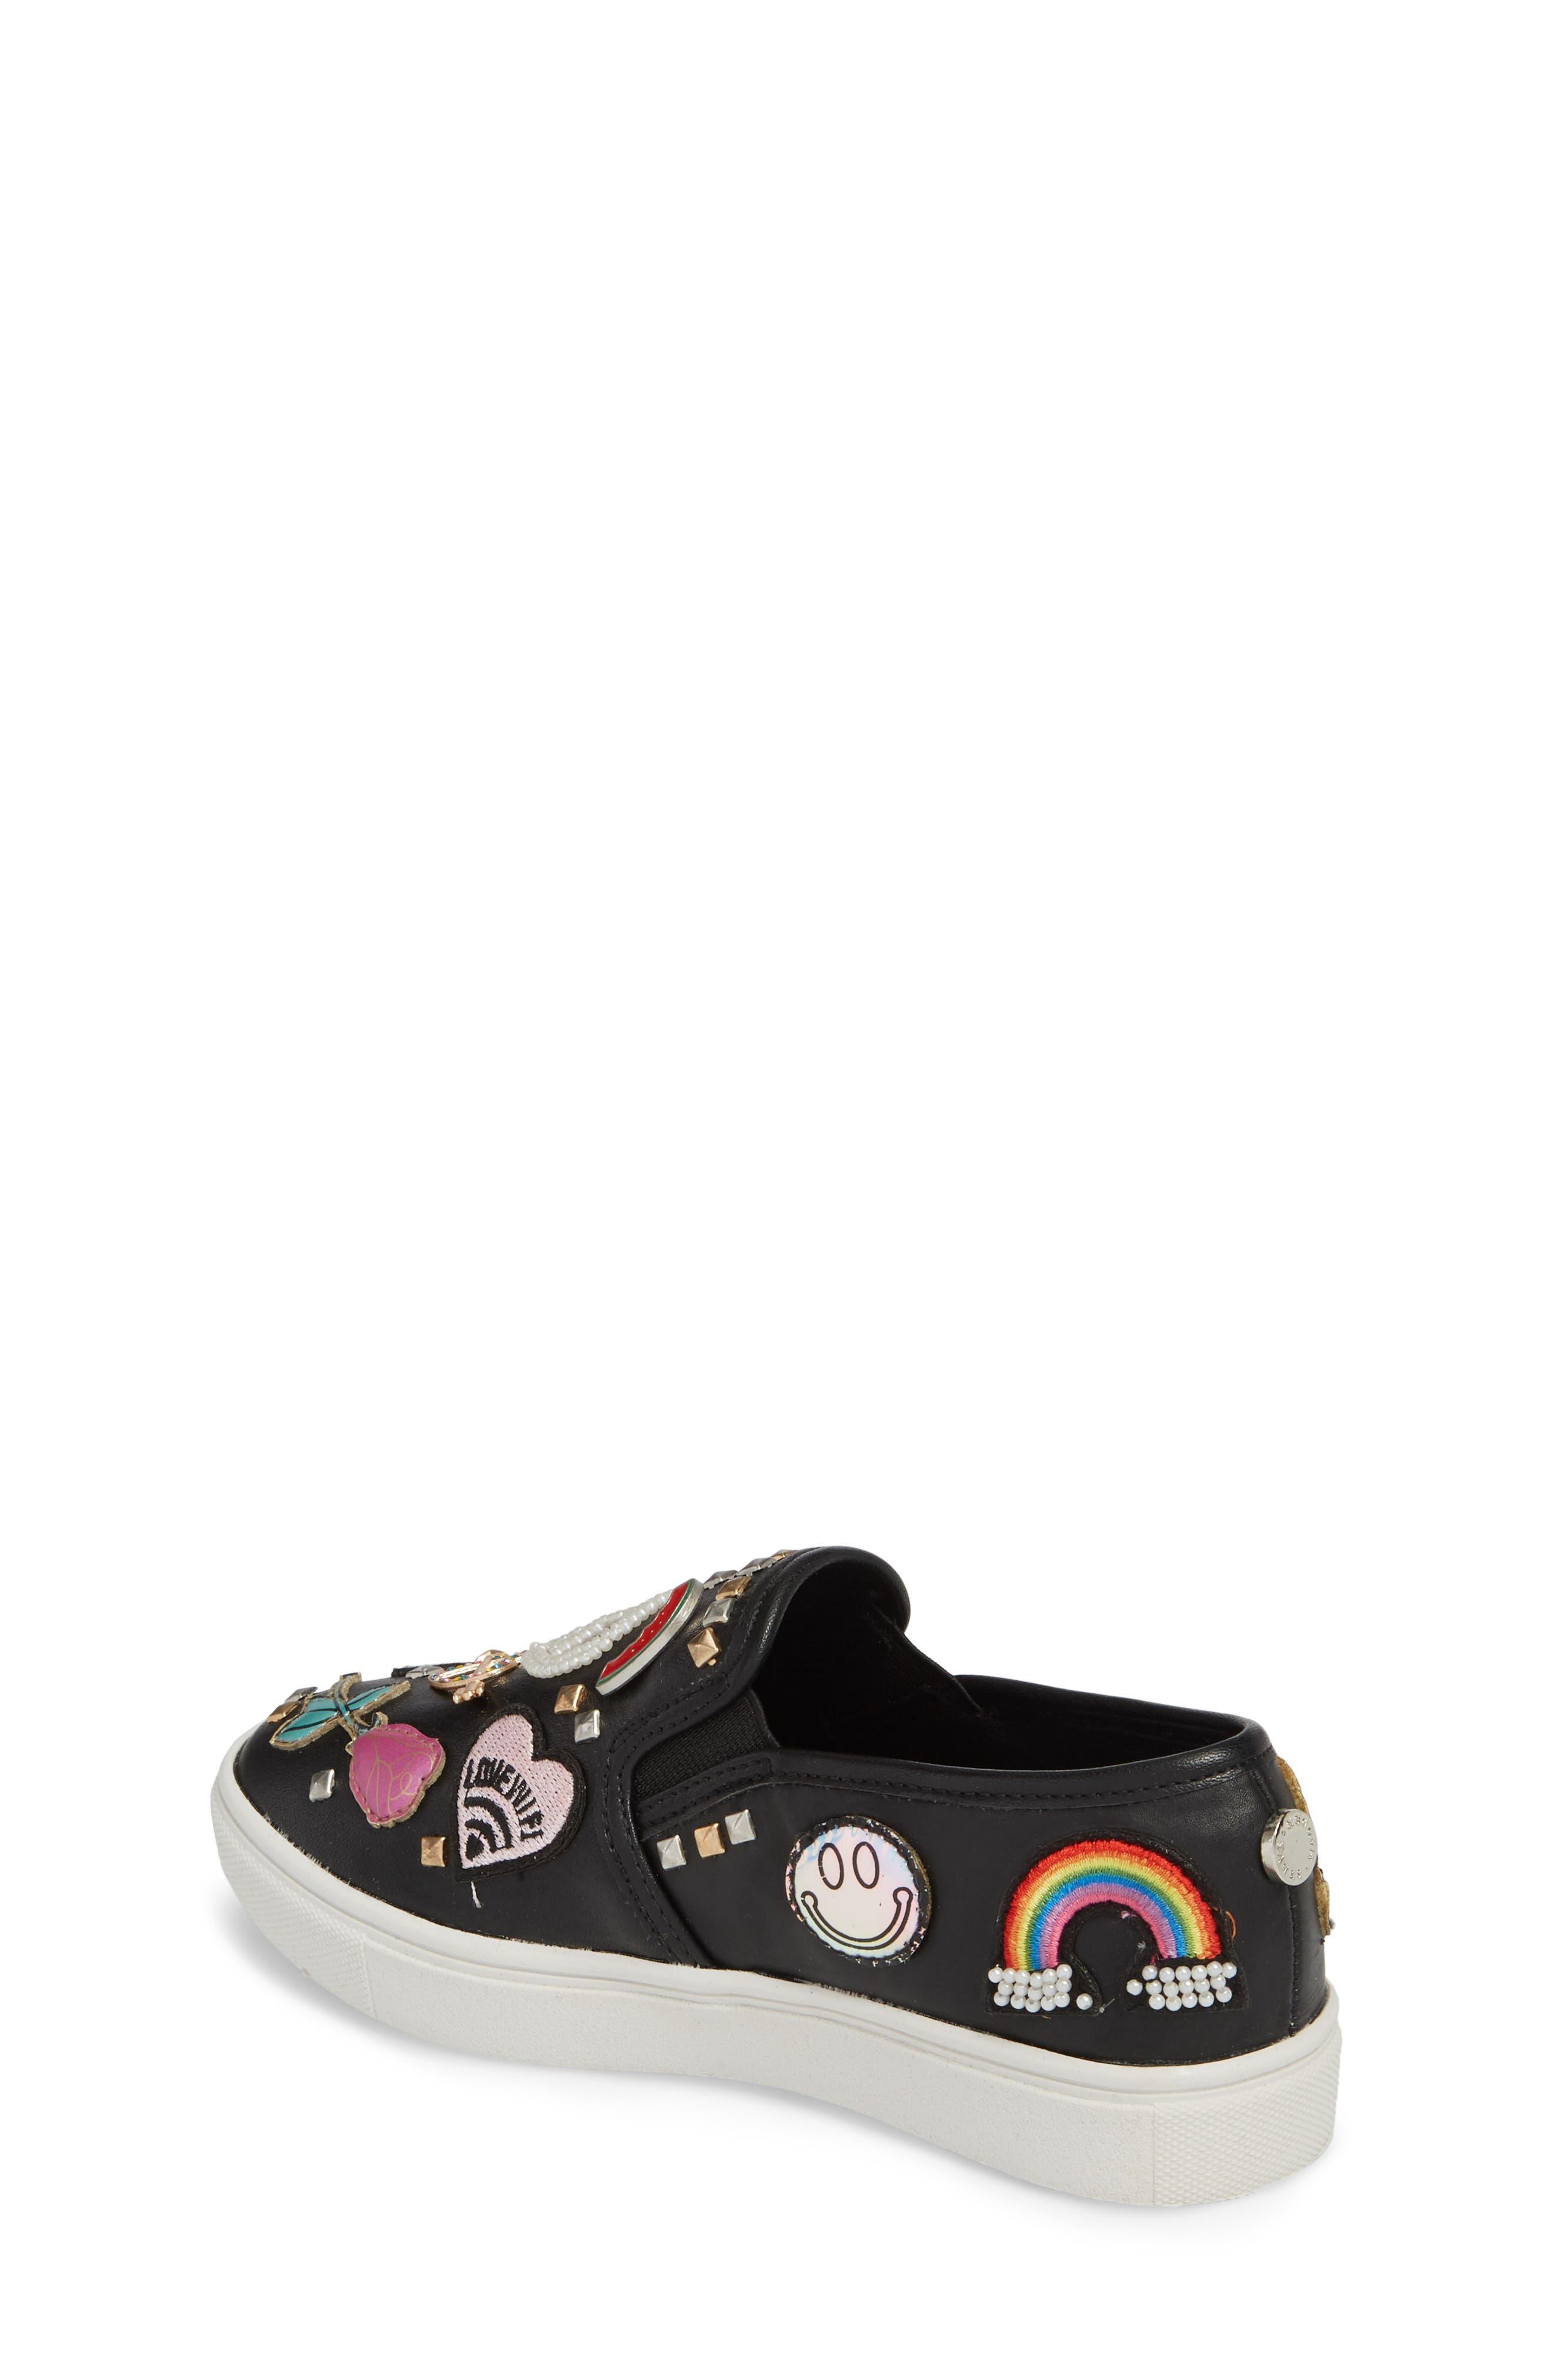 JCraze Embellished Slip-On Sneaker,                             Alternate thumbnail 2, color,                             Black